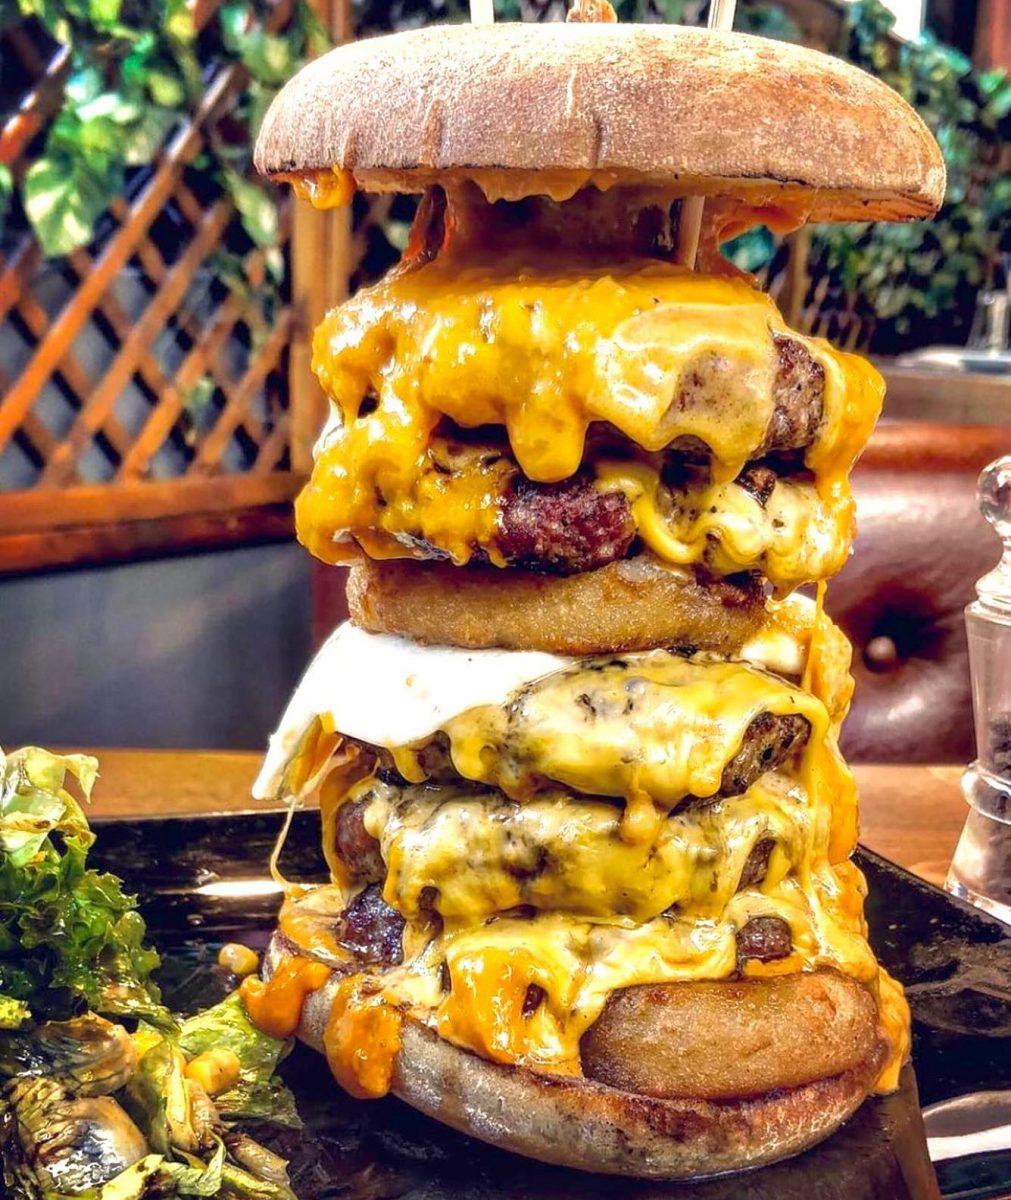 Butcher's: Το μπέργκερ που χορταίνεις για μια βδομάδα μόνο που το βλέπεις